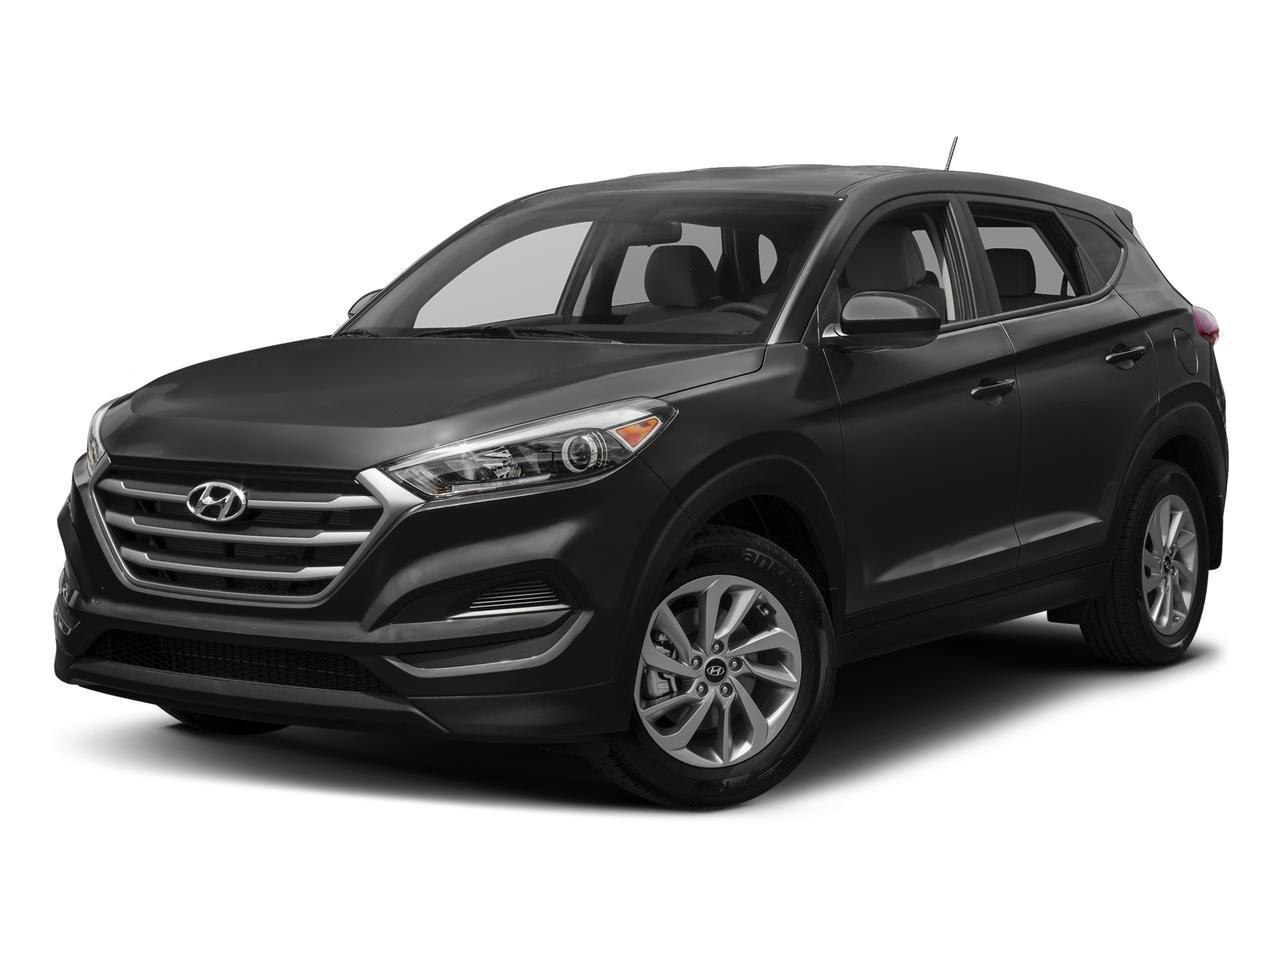 2017 Hyundai Tucson Vehicle Photo in Owensboro, KY 42303